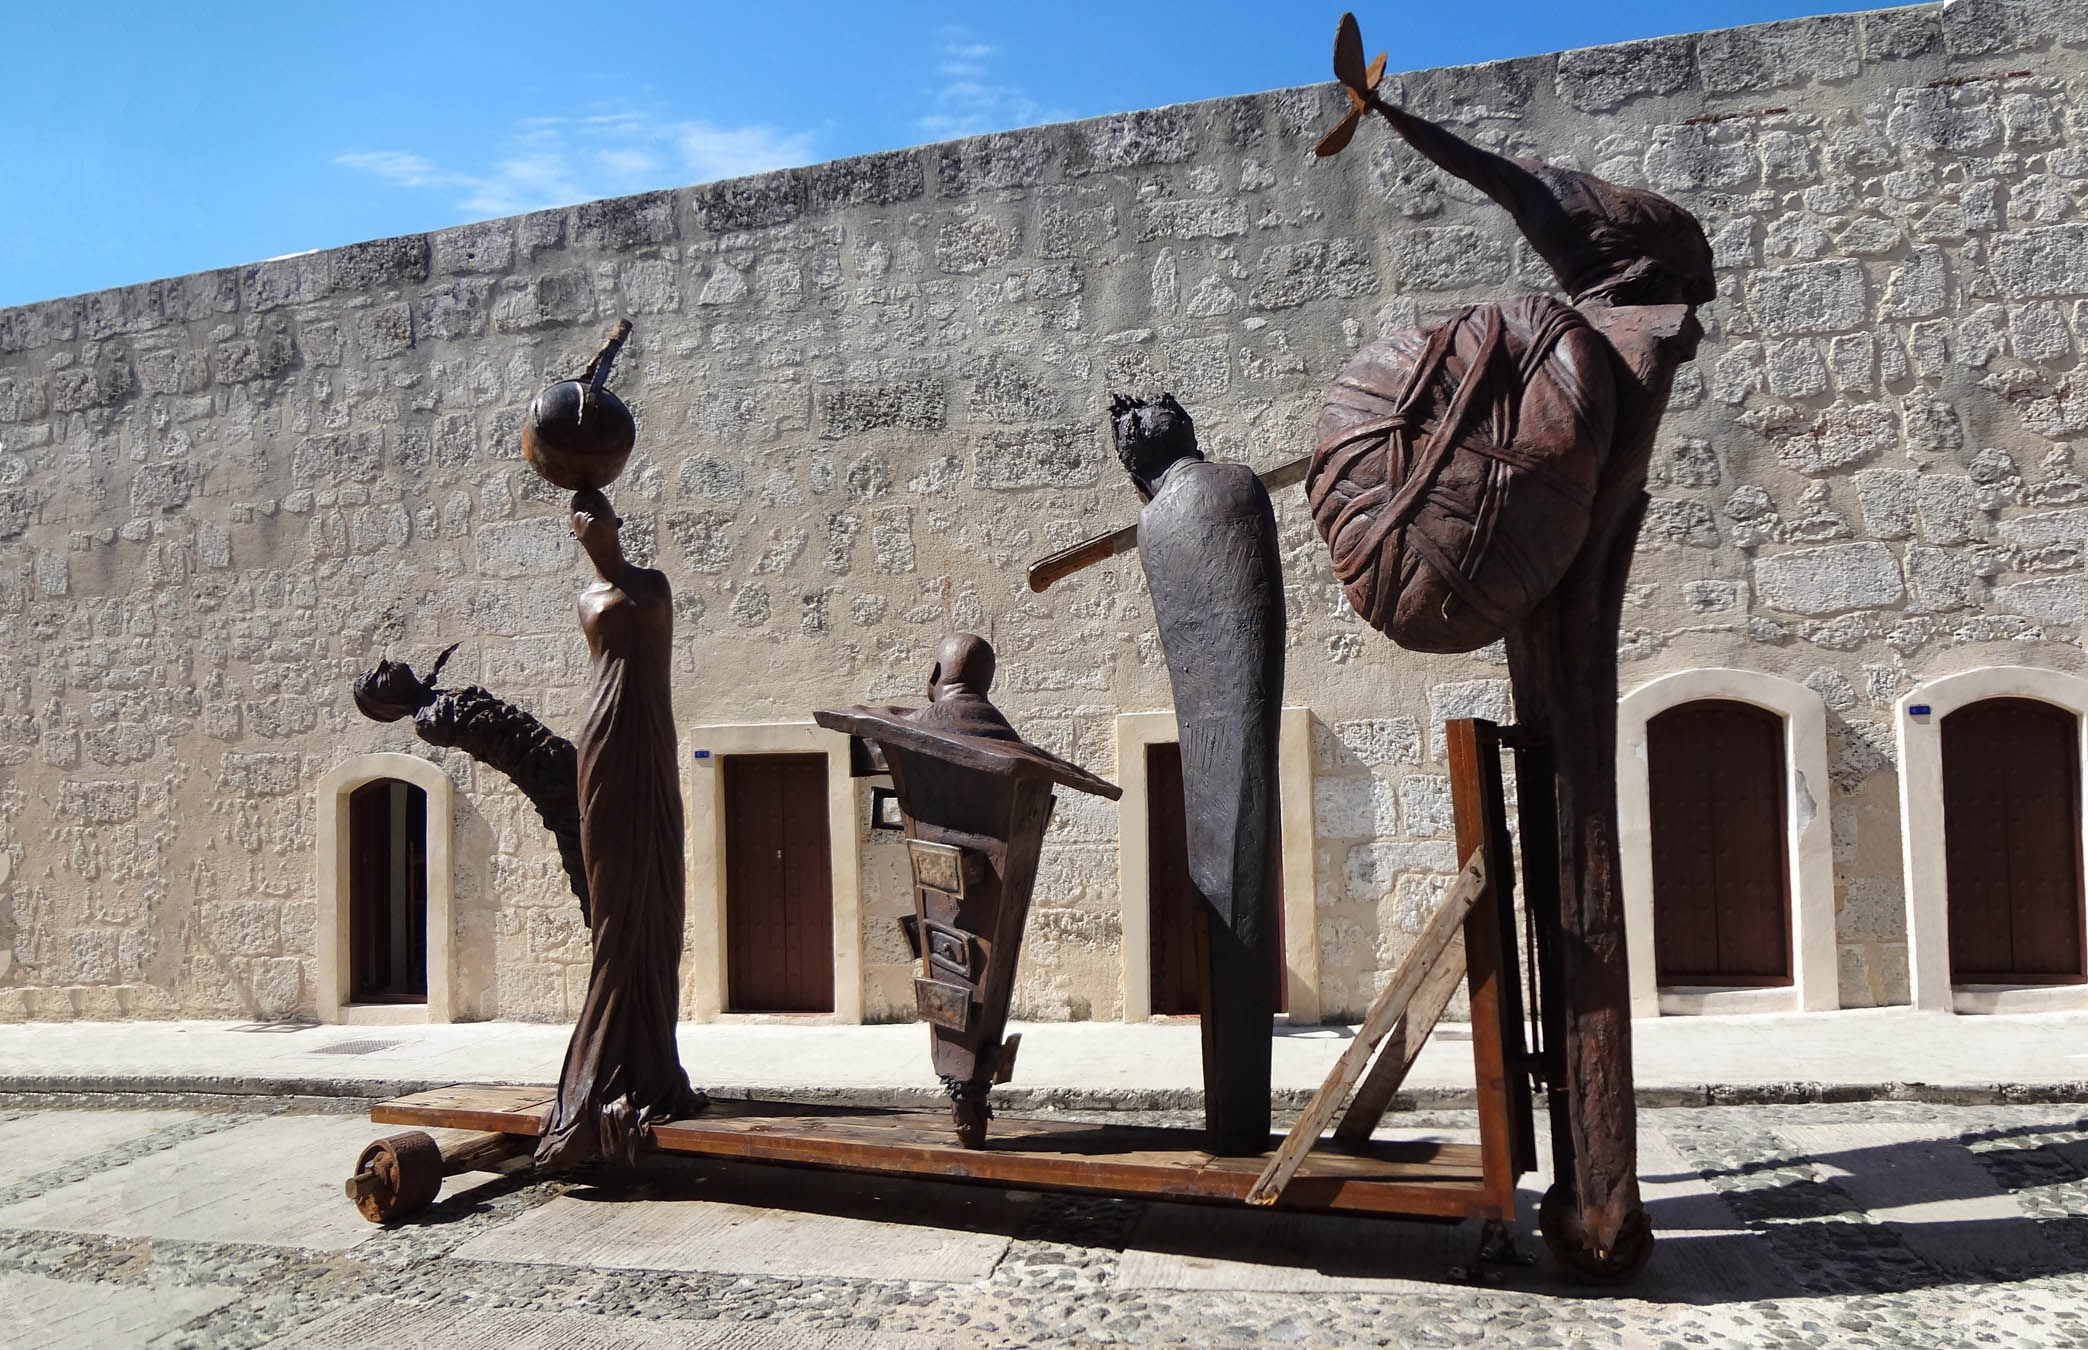 La comparsa. 11th Havana Biennial